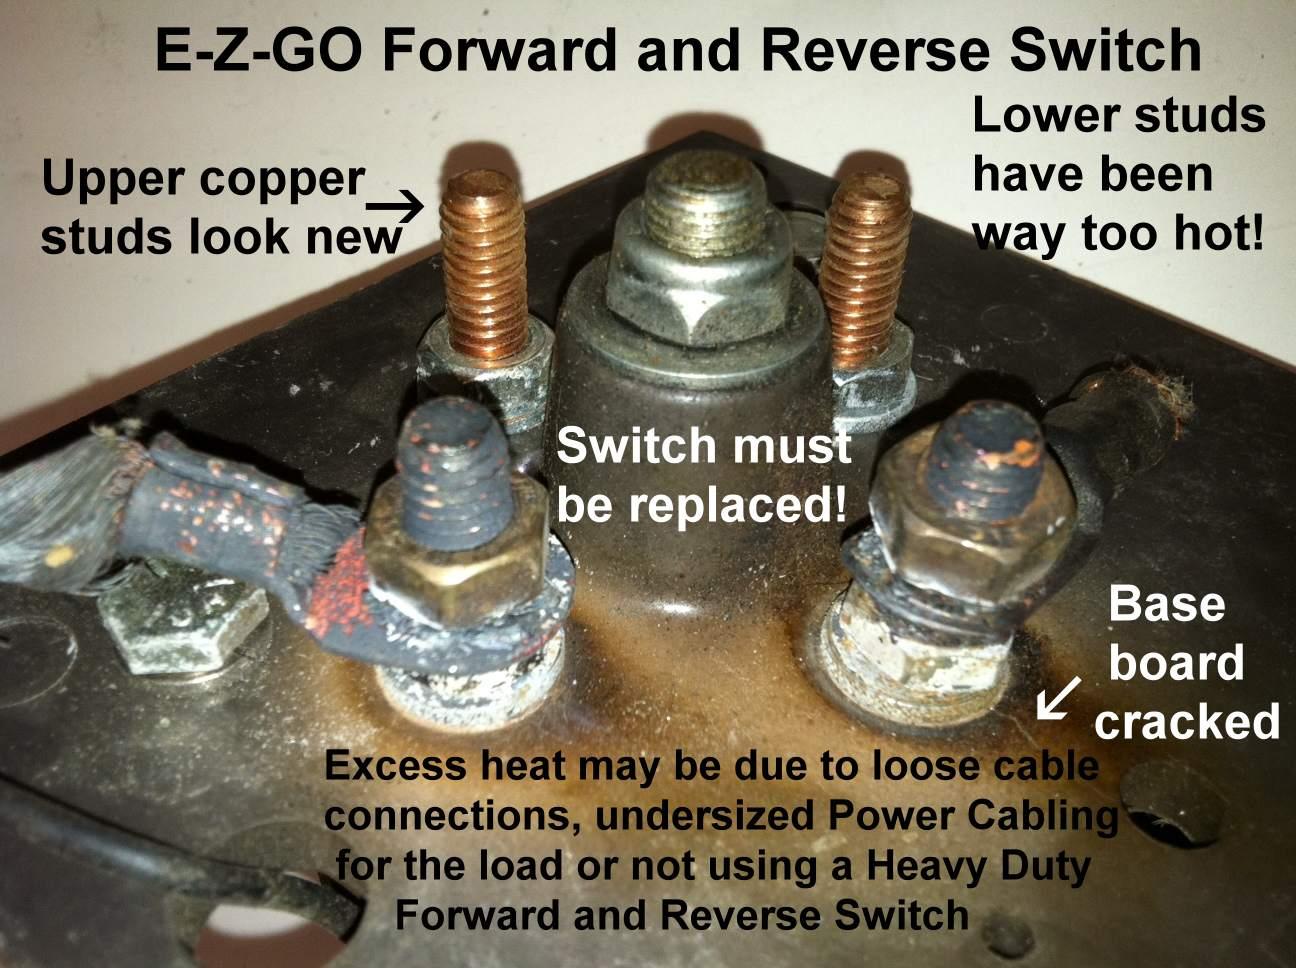 Ezgo Forward Reverse Switch Wiring Diagram | Manual E-Books - Ezgo Forward Reverse Switch Wiring Diagram